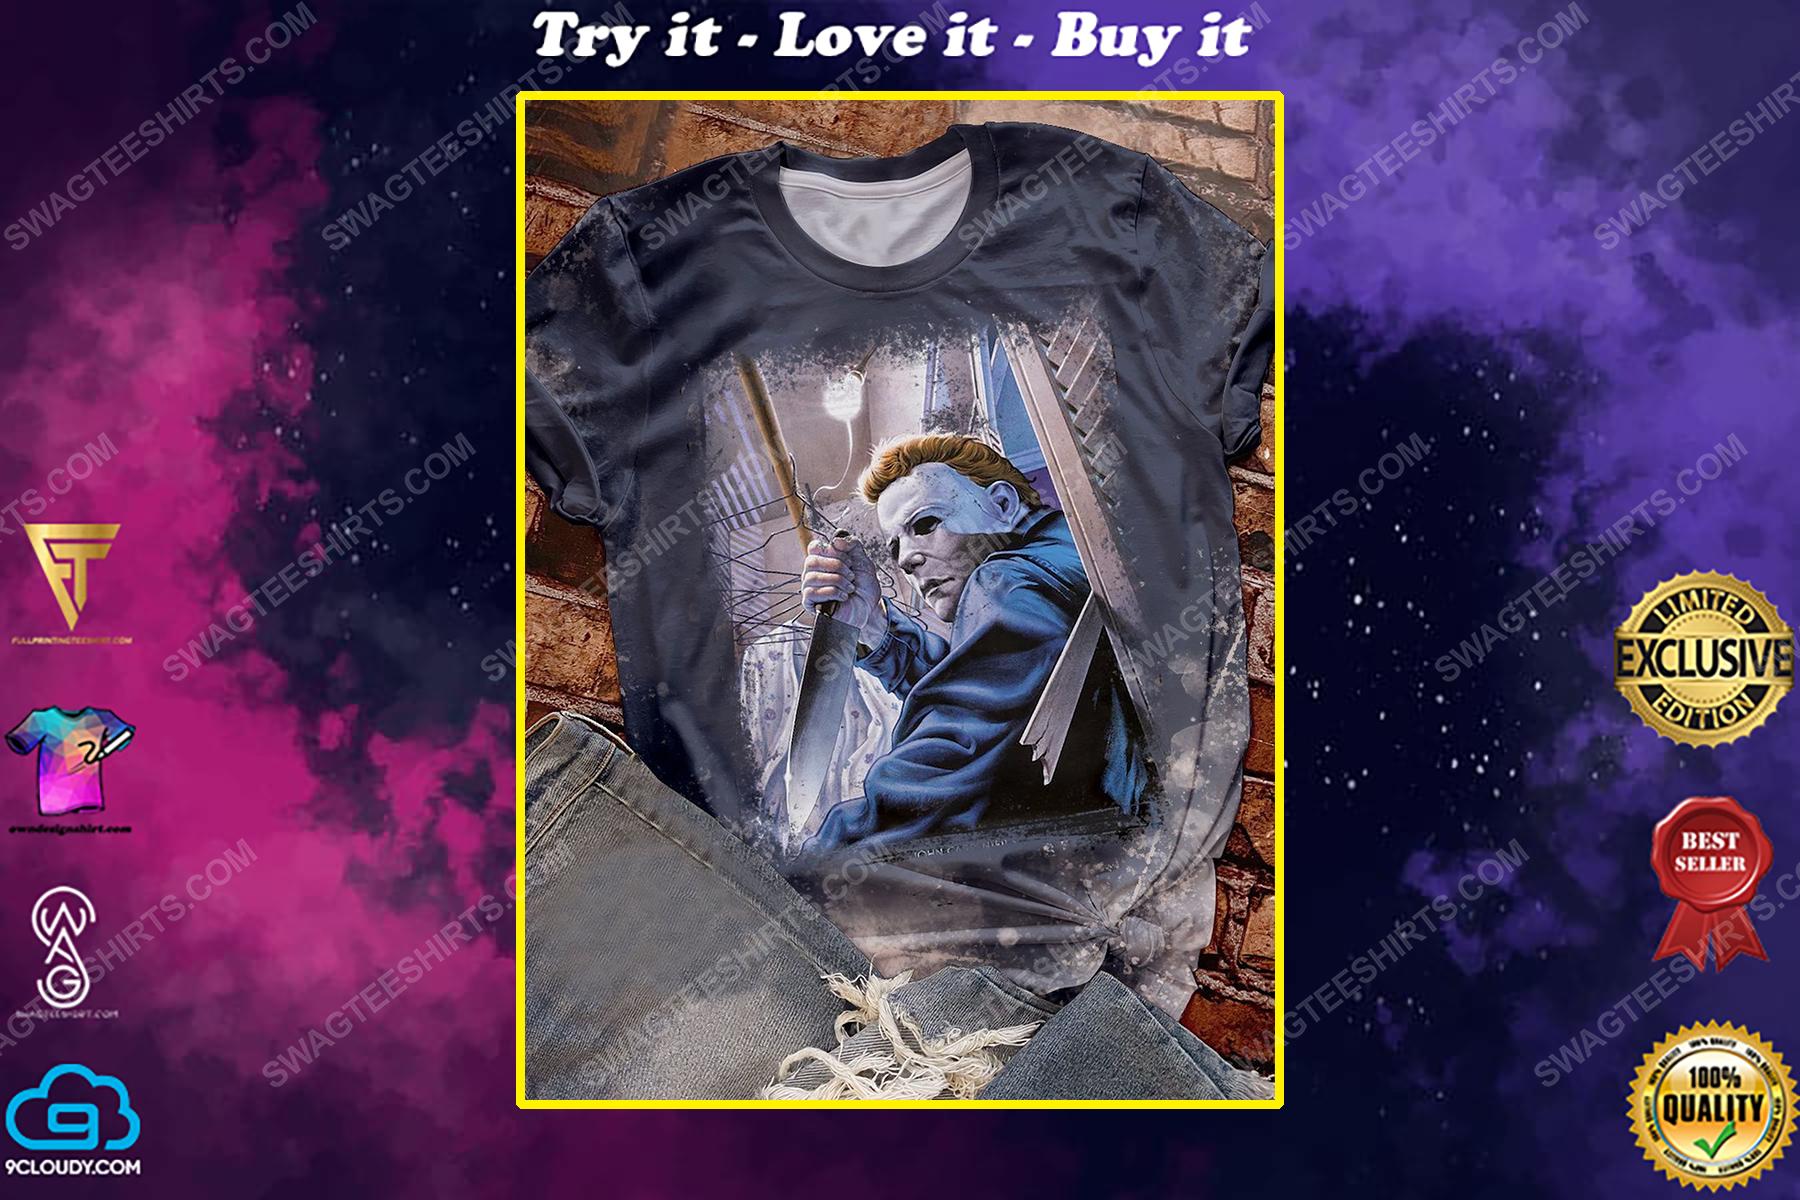 Michael myers in halloween night full print shirt